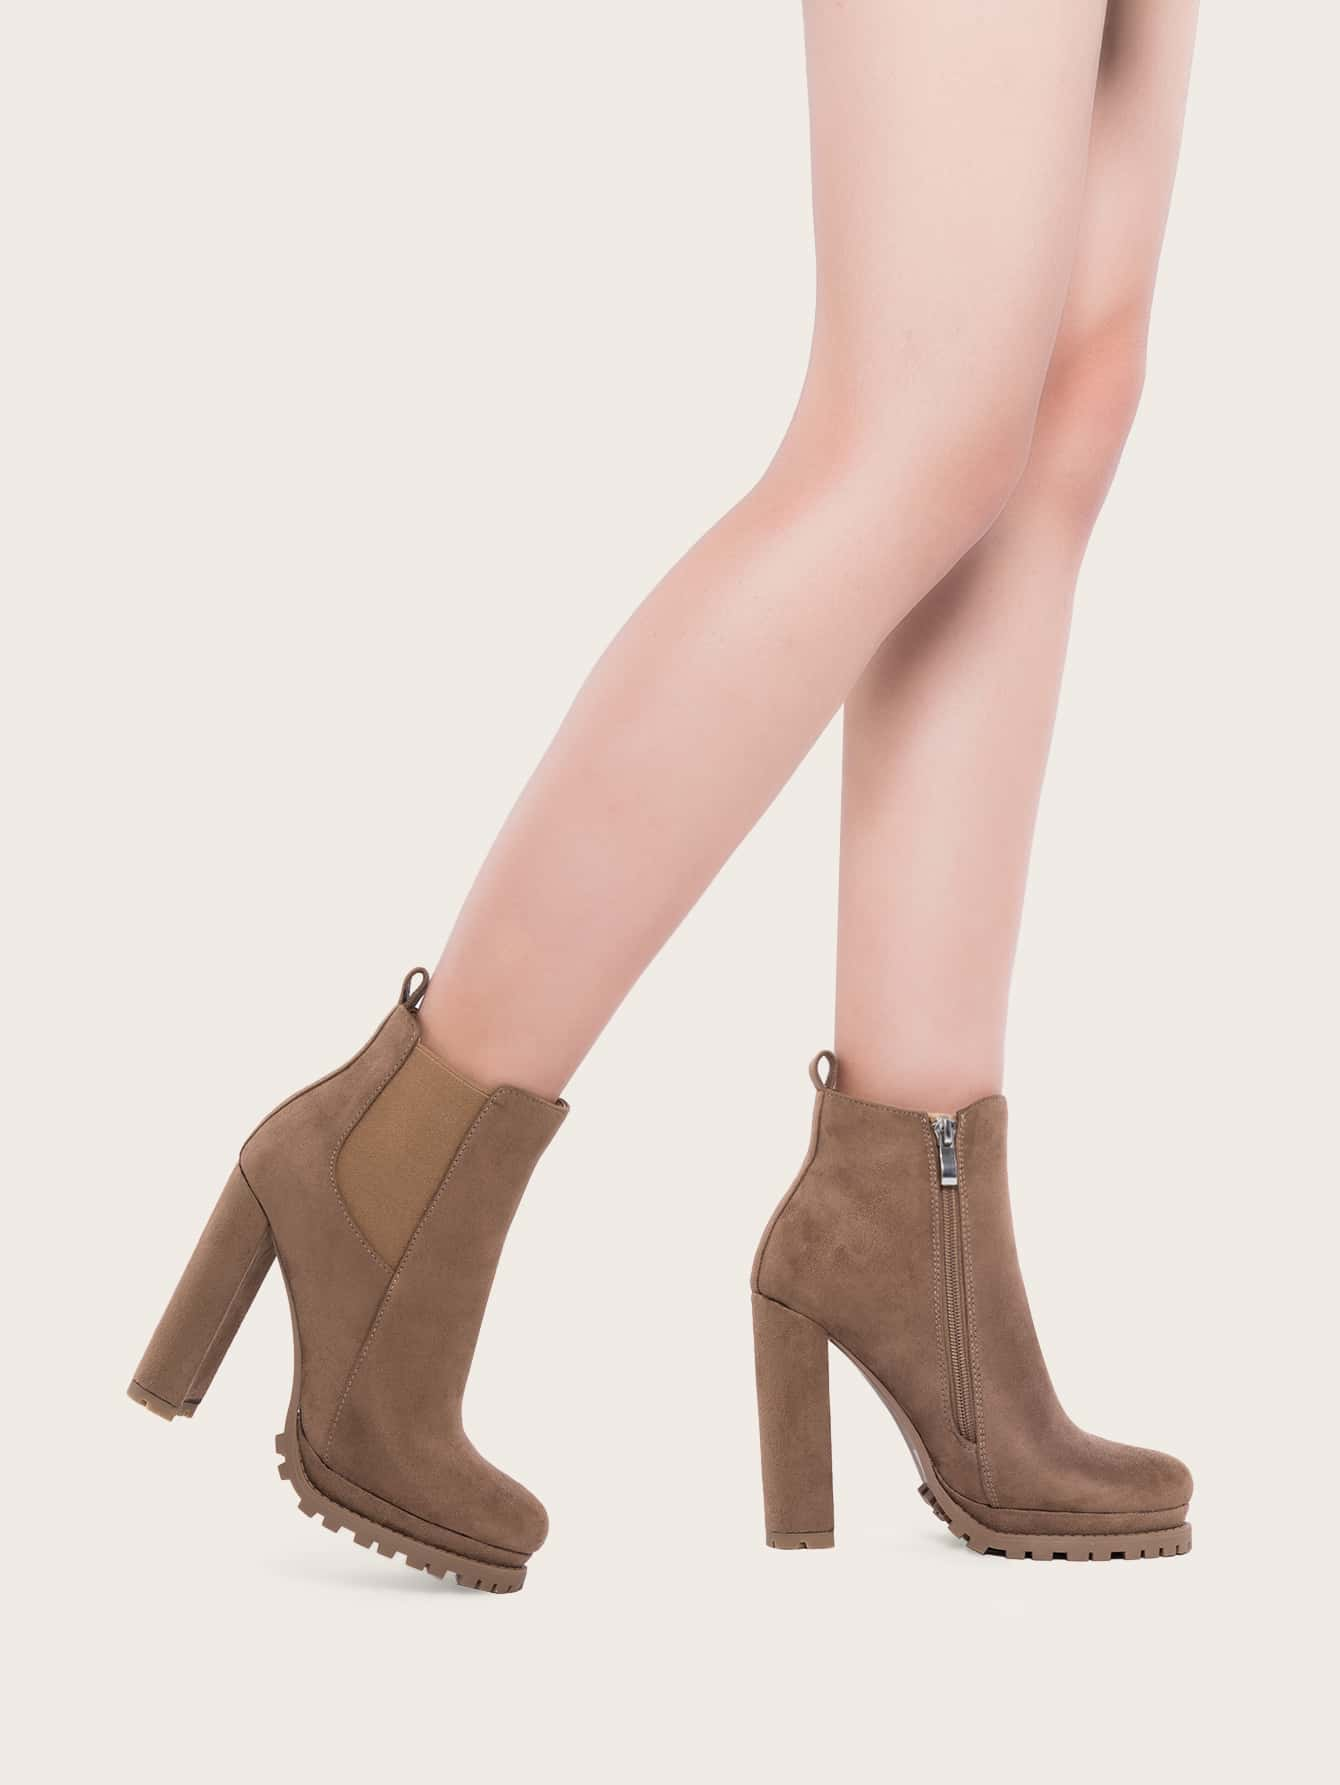 Minimalist Chunky Heeled Chelsea Boots